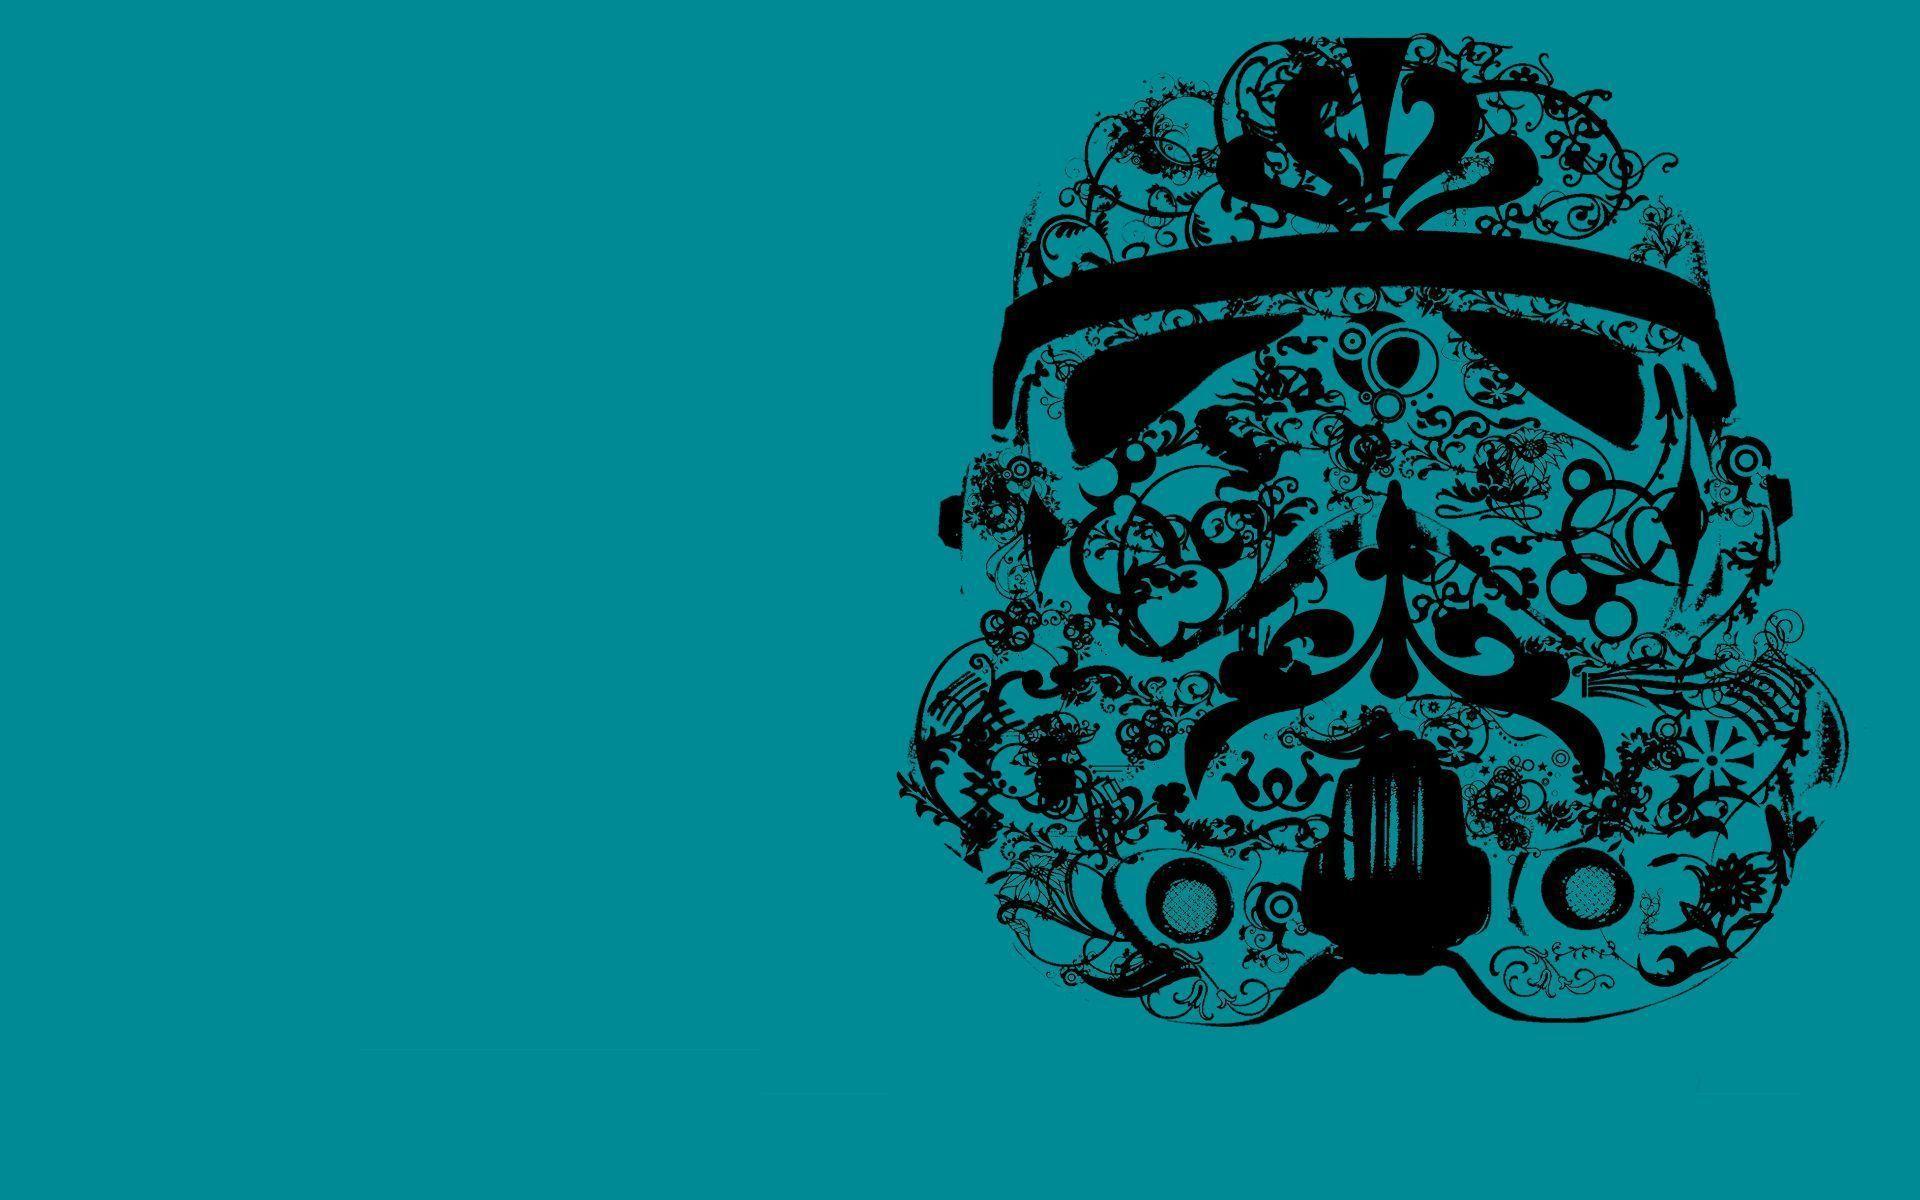 Stormtrooper Art wallpaper - 549486